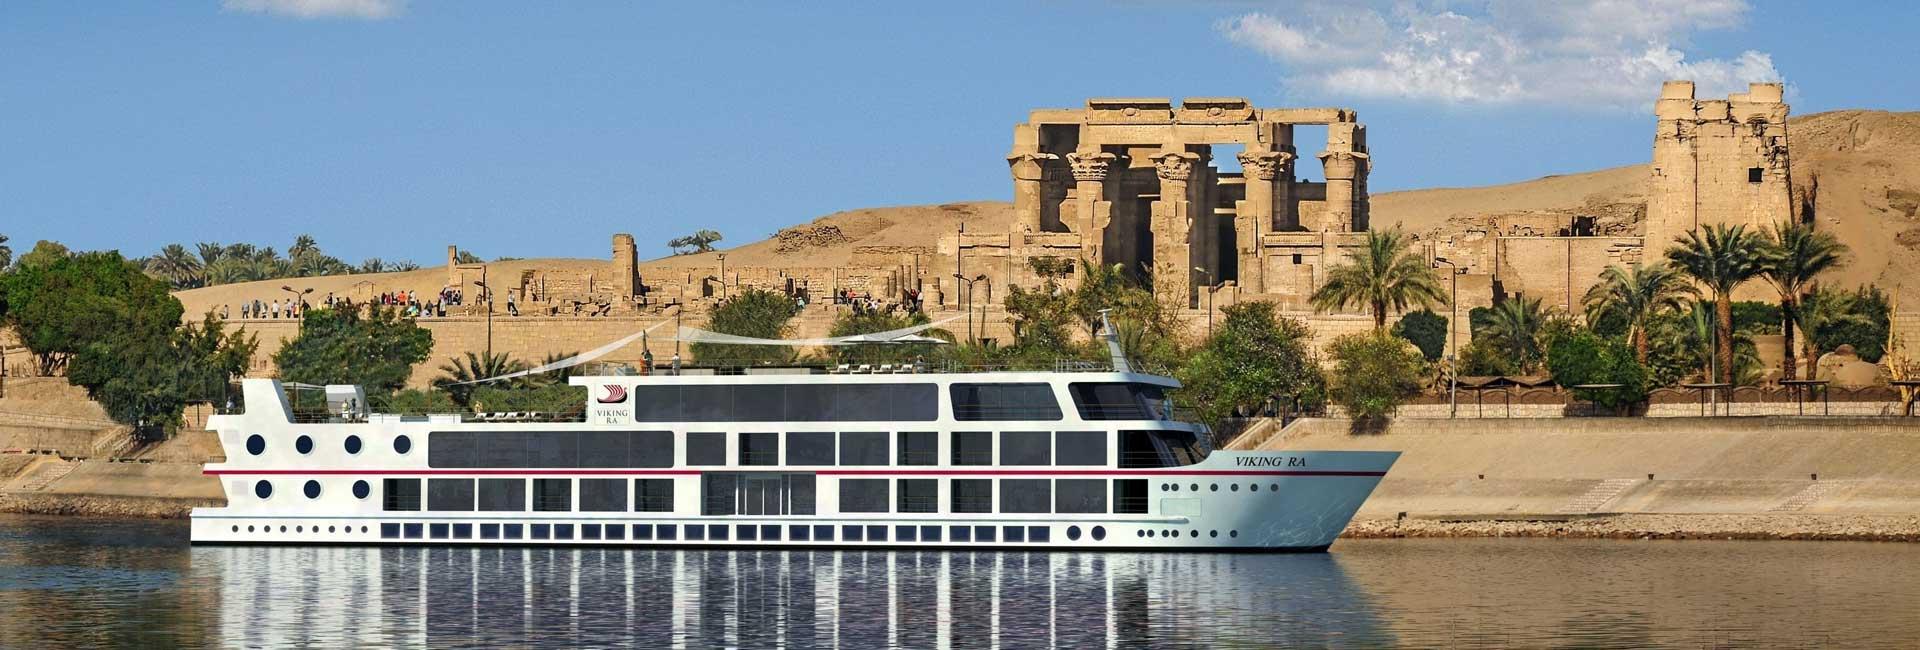 Aswan Information